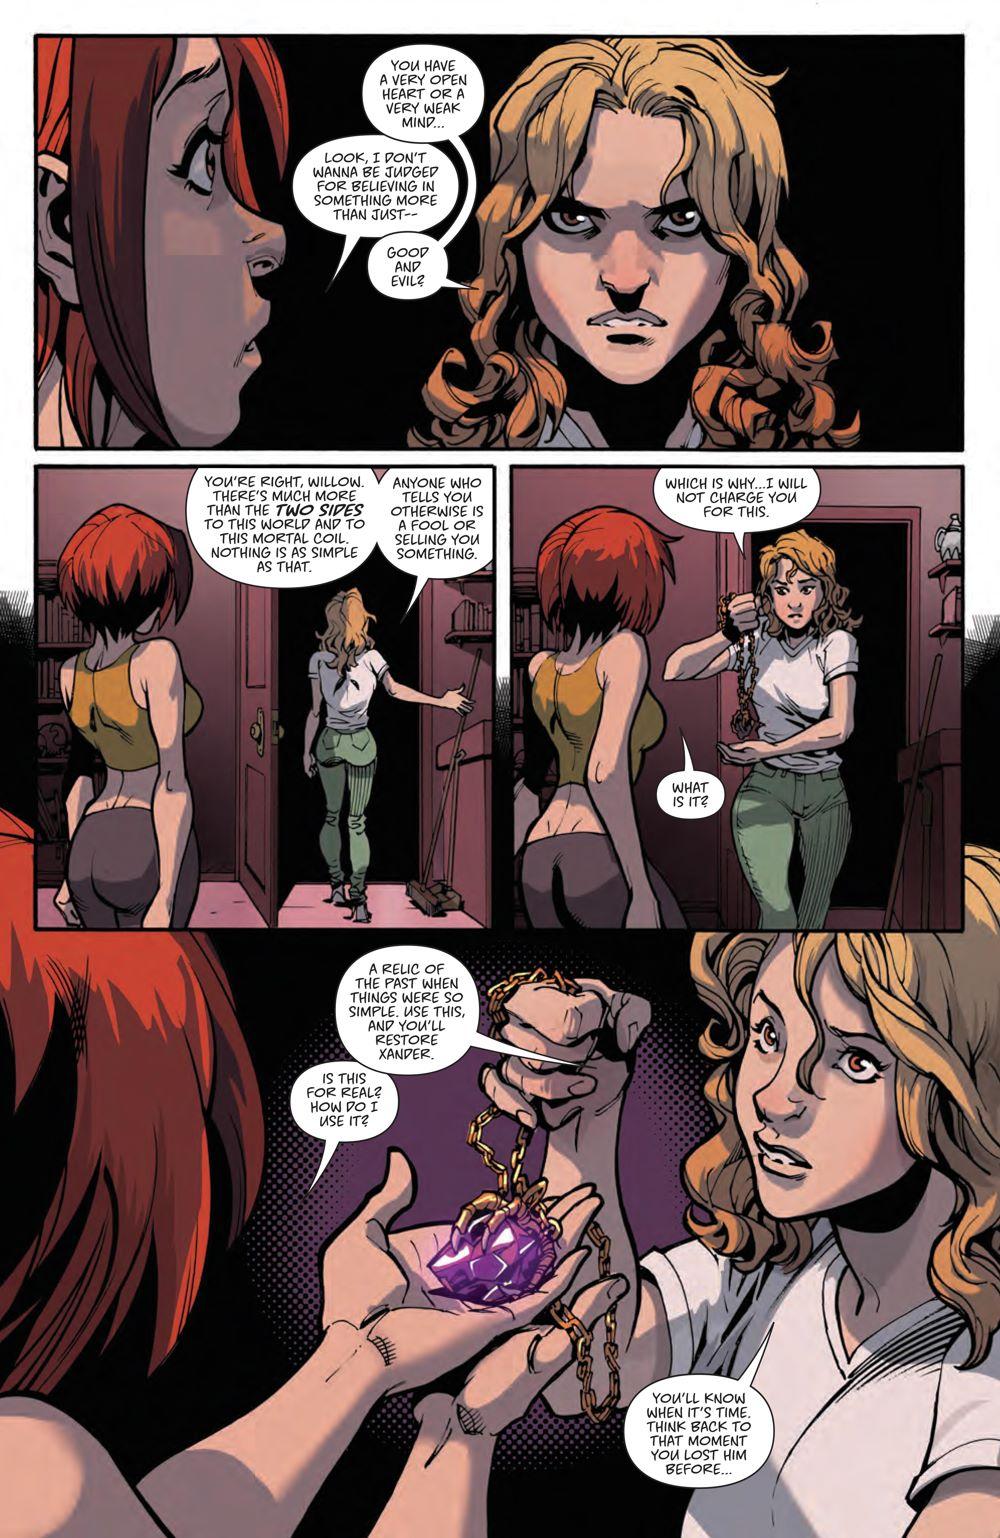 Buffy_020_PRESS_6 ComicList Previews: BUFFY THE VAMPIRE SLAYER #20